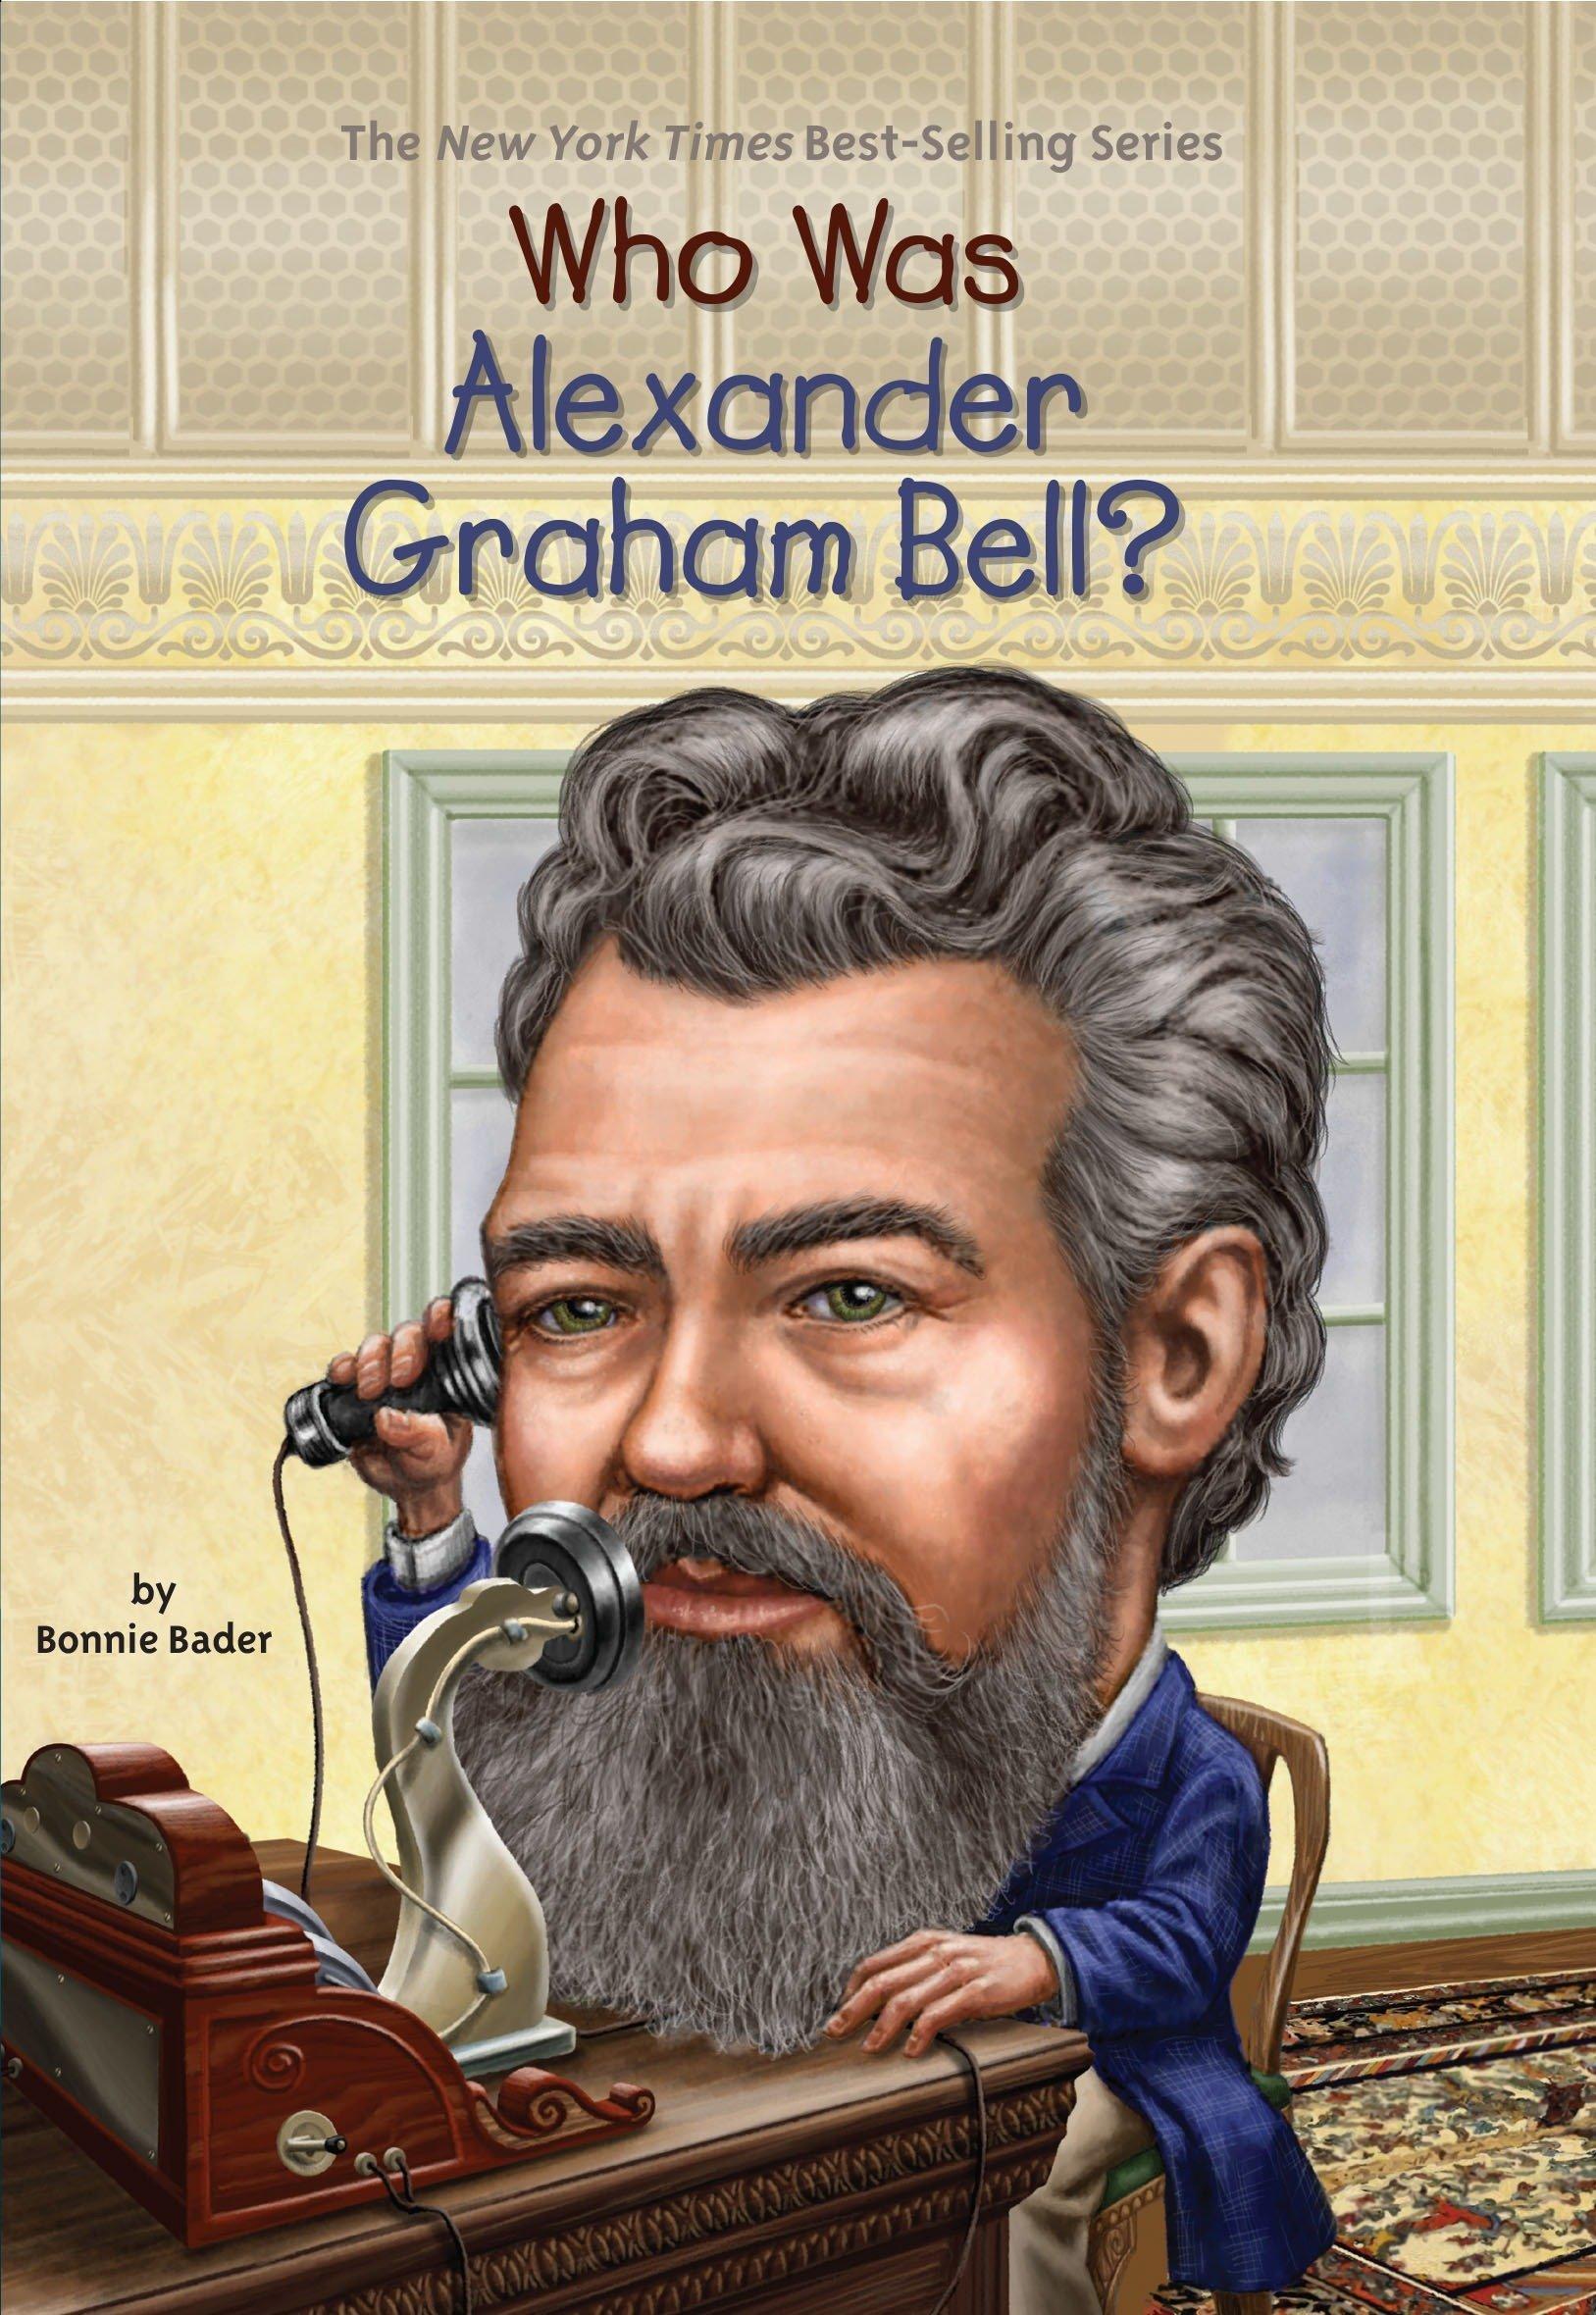 Alexander Graham Bell - Pictures, Photos